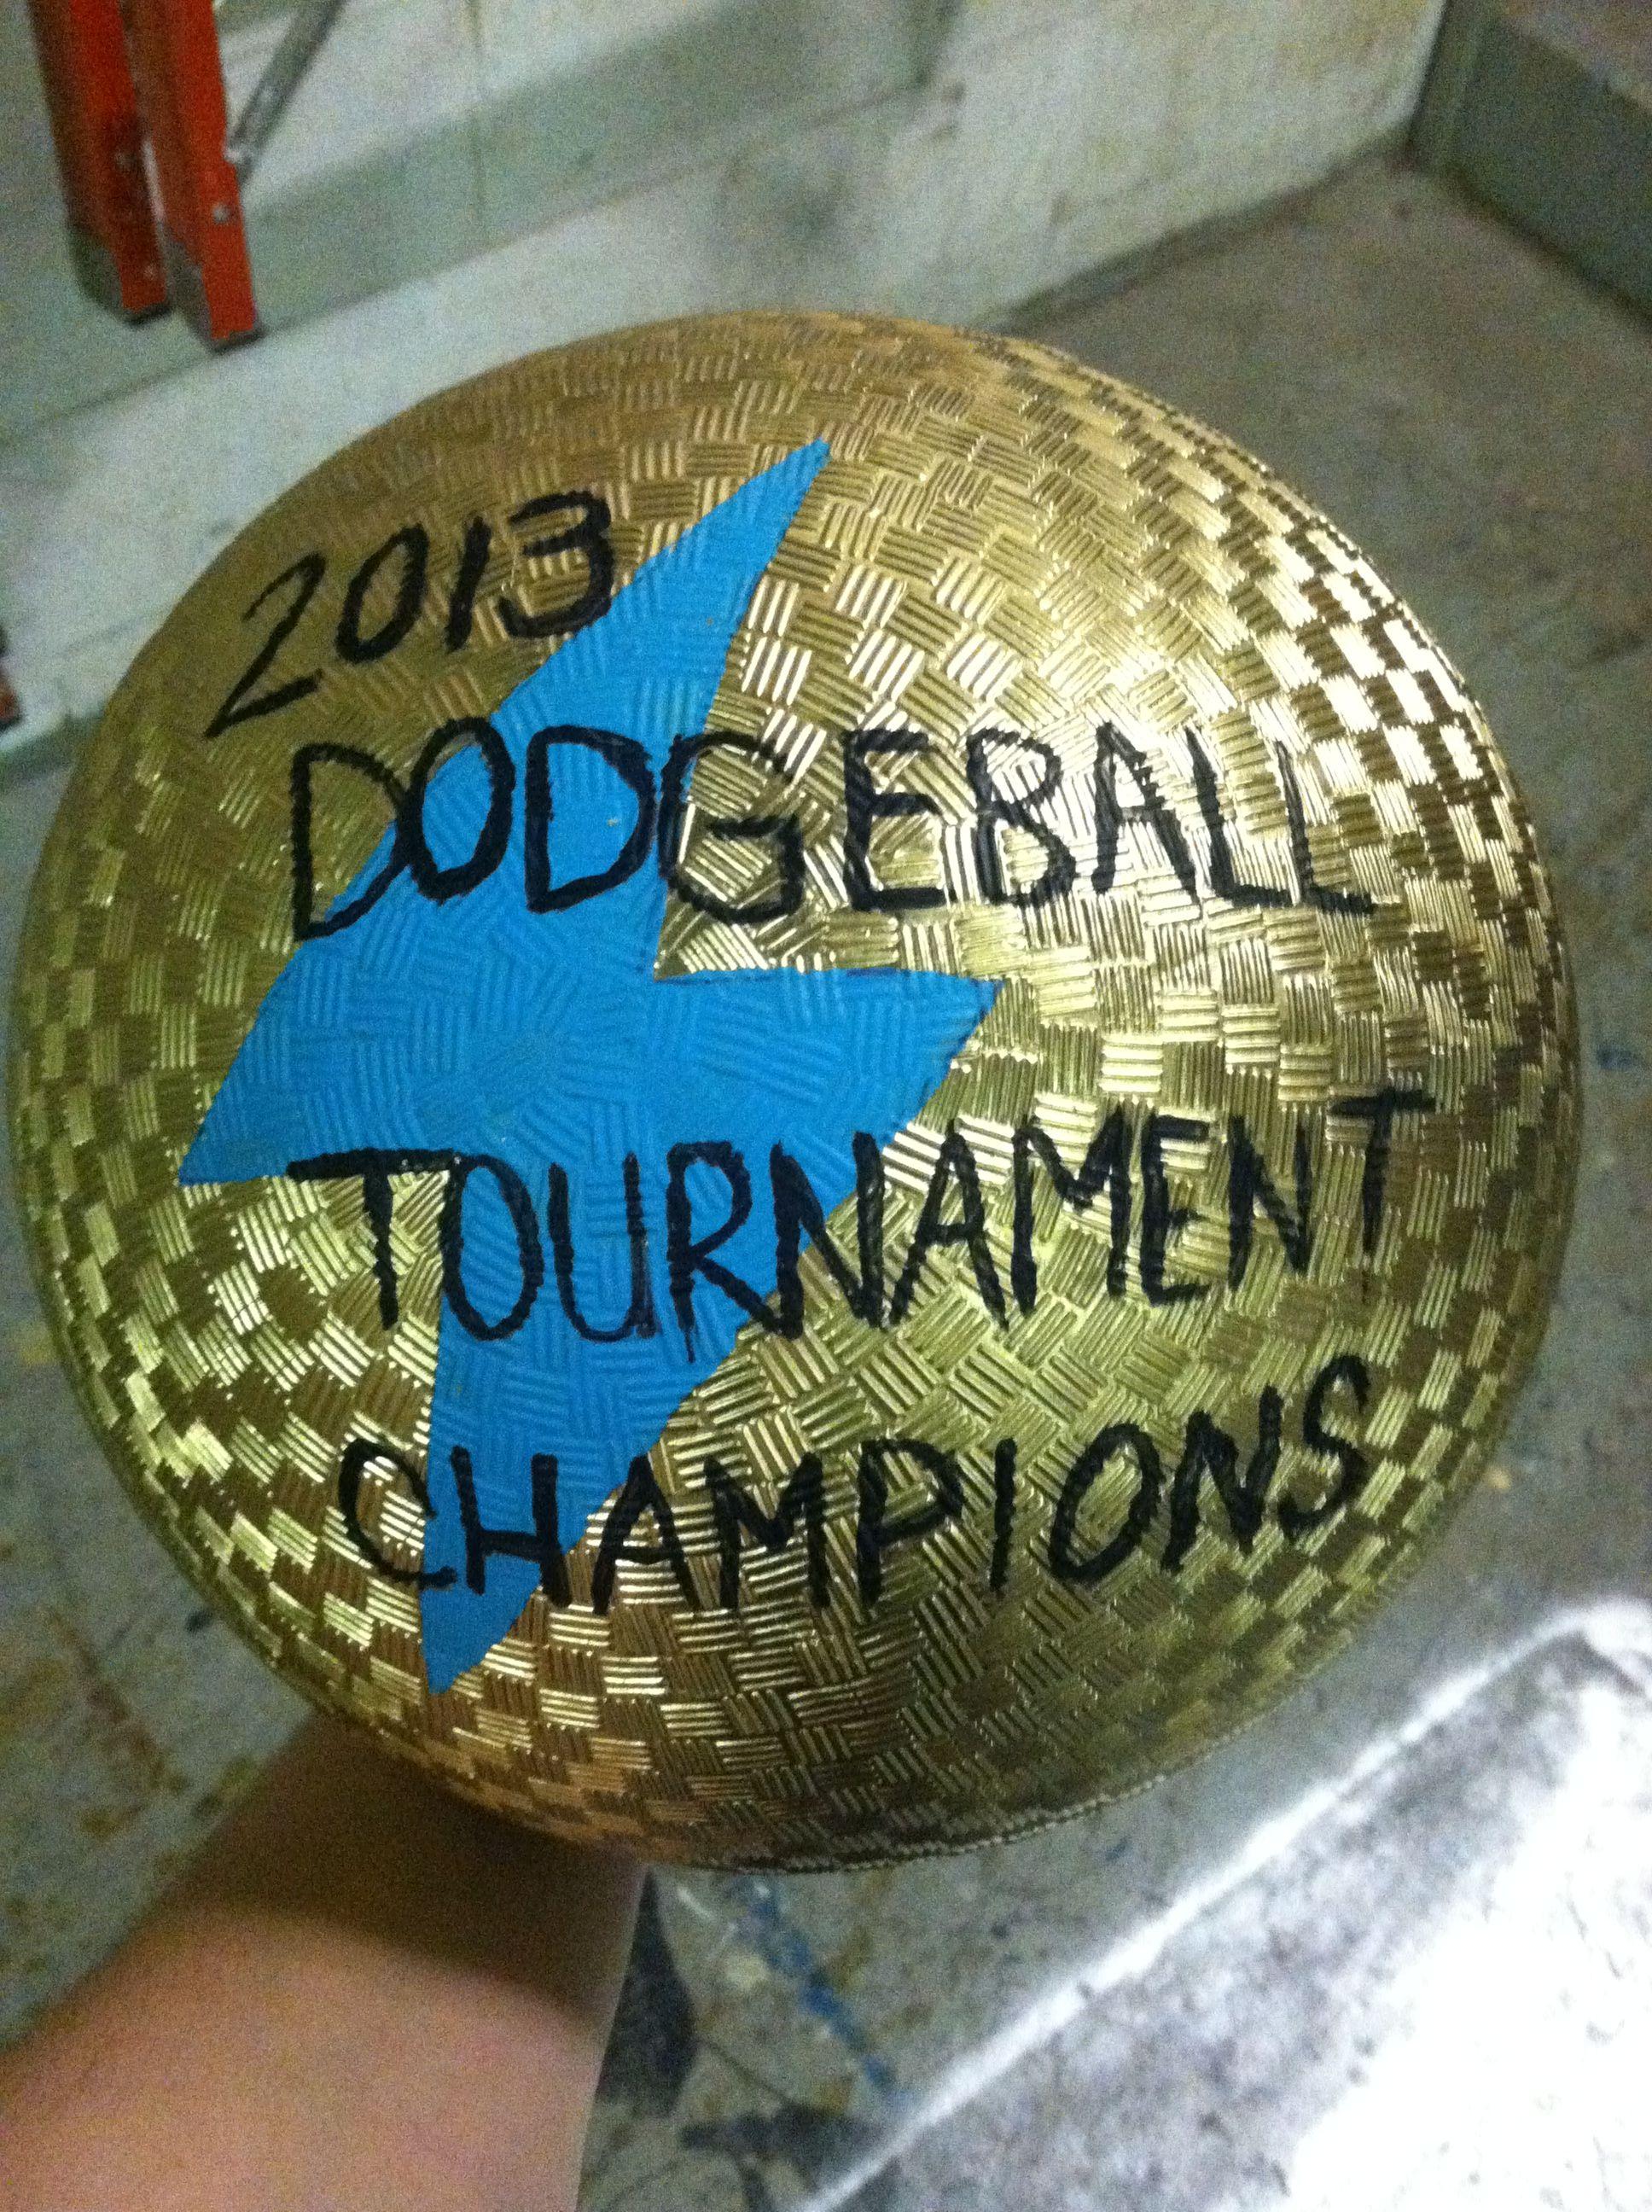 Fuse dodgeball trophy stuff we build pinterest to